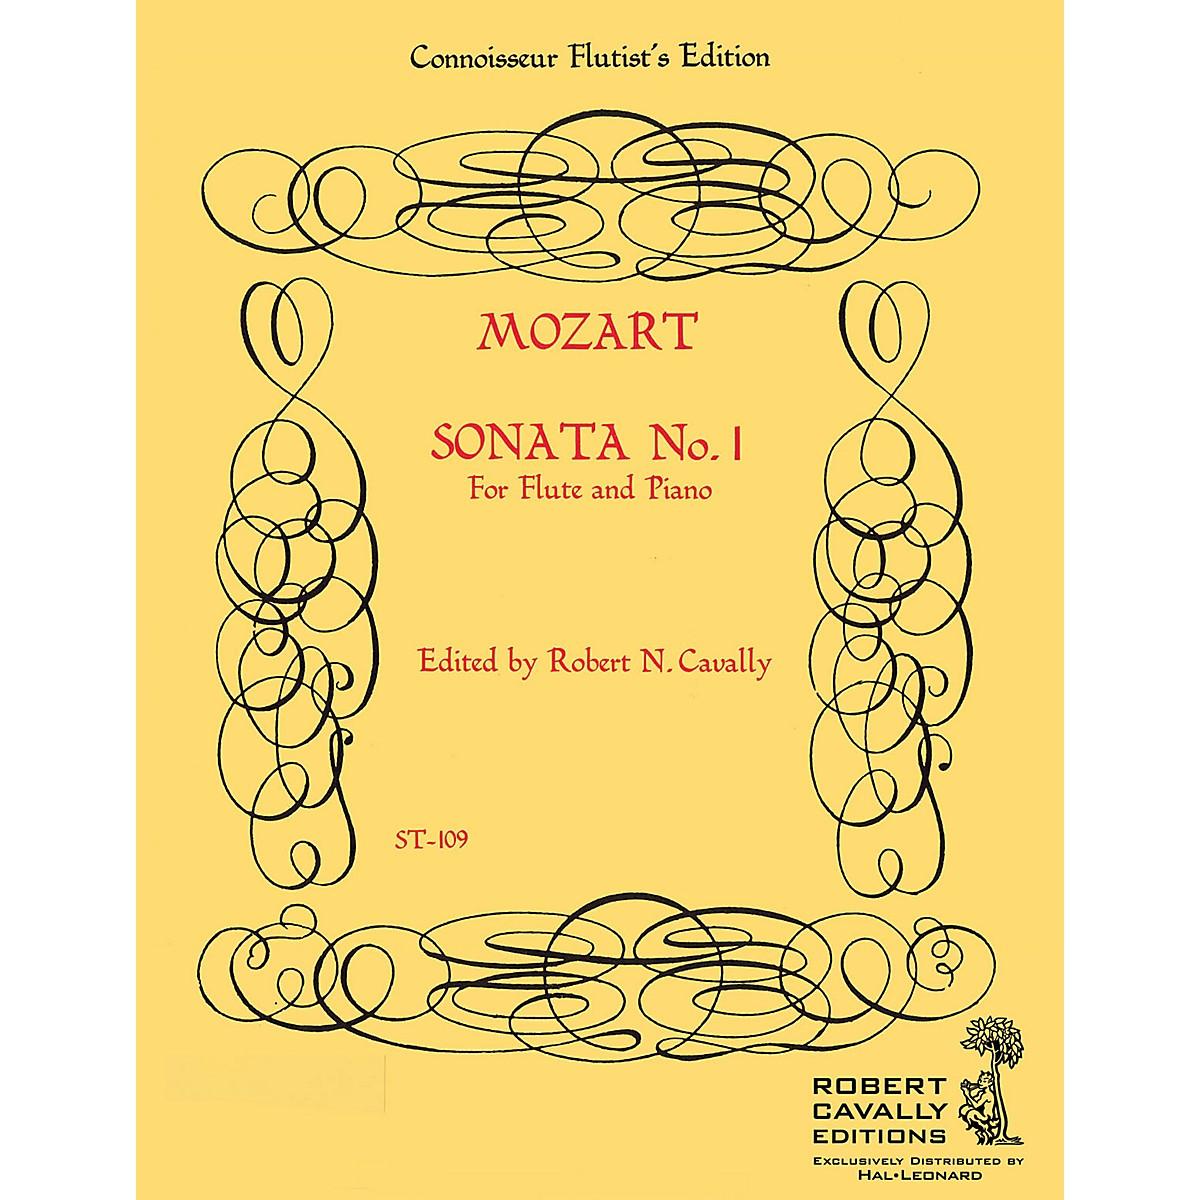 Cavally Editions Sonata No. 1 in Bb (Connoisseur Flutist's Edition) Robert Cavally Editions Series by Robert Cavally